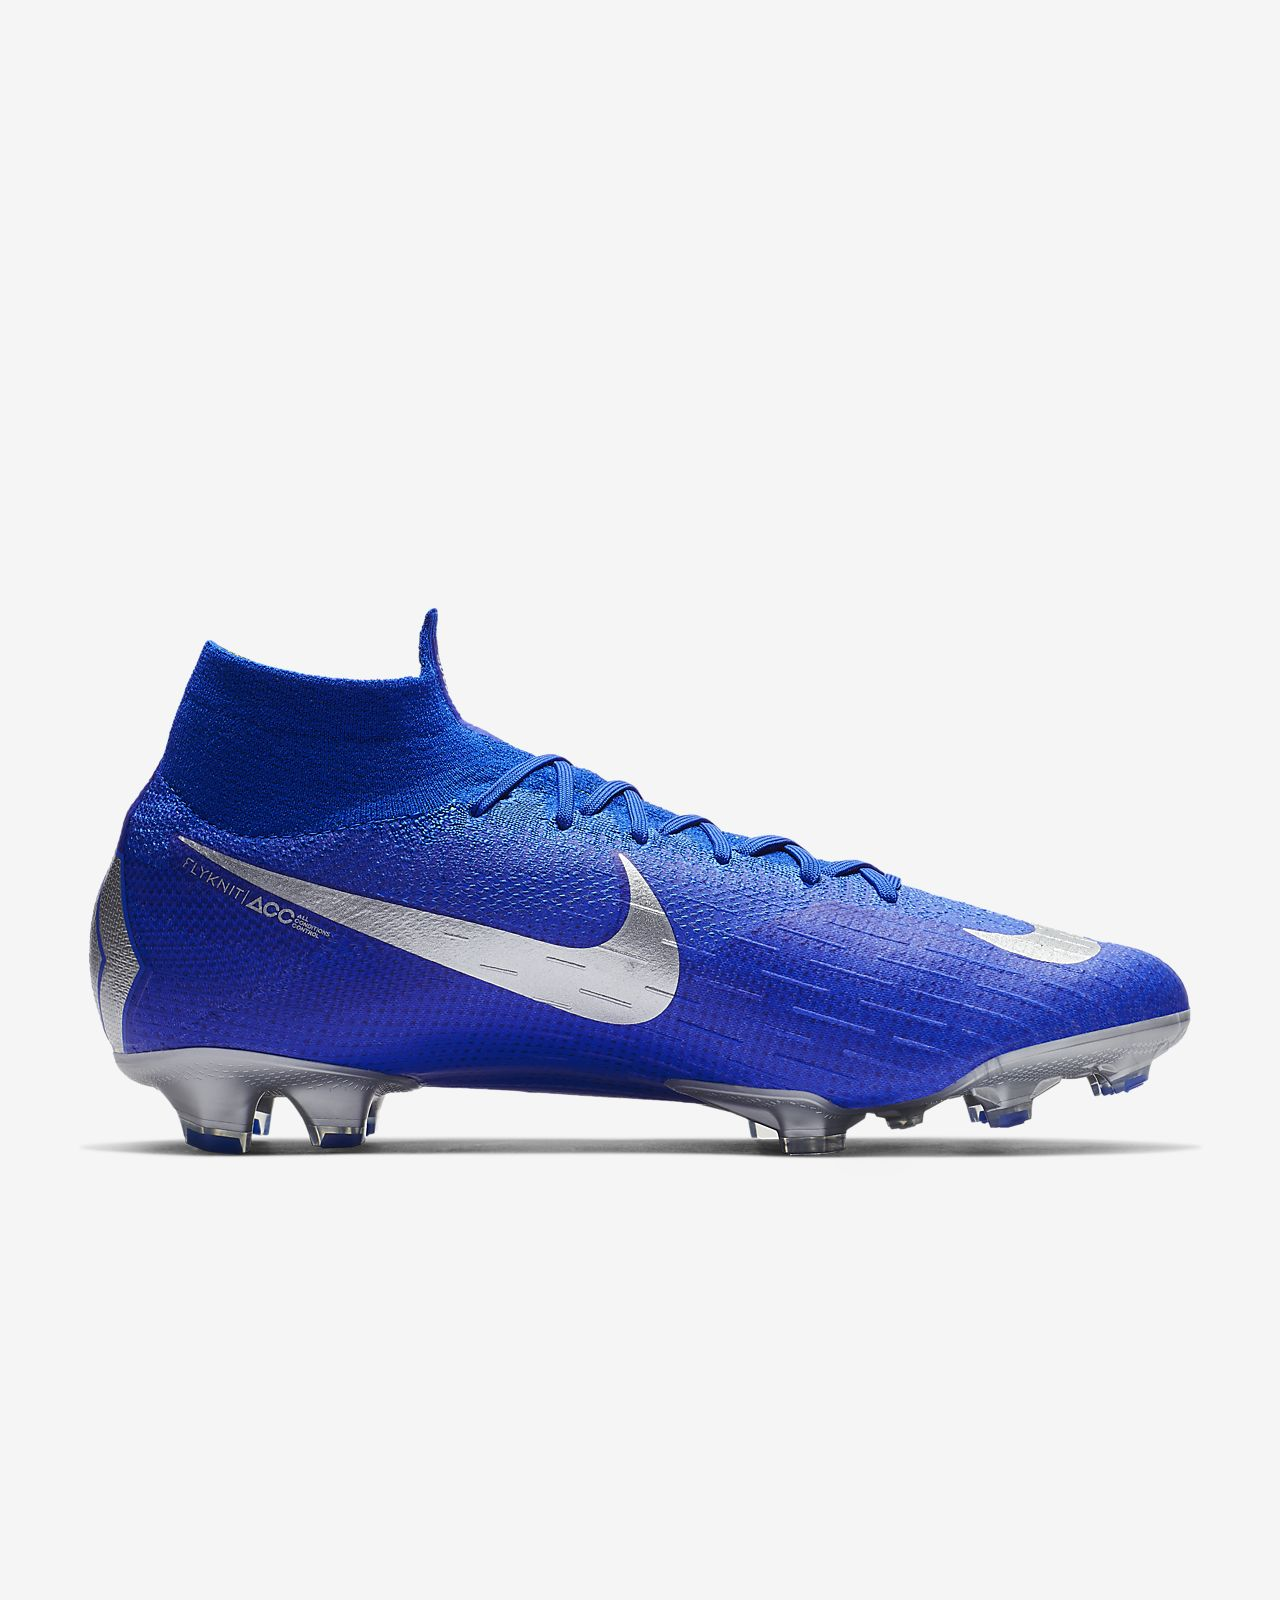 38409152152f Nike Superfly 6 Elite FG Firm-Ground Football Boot. Nike.com GB